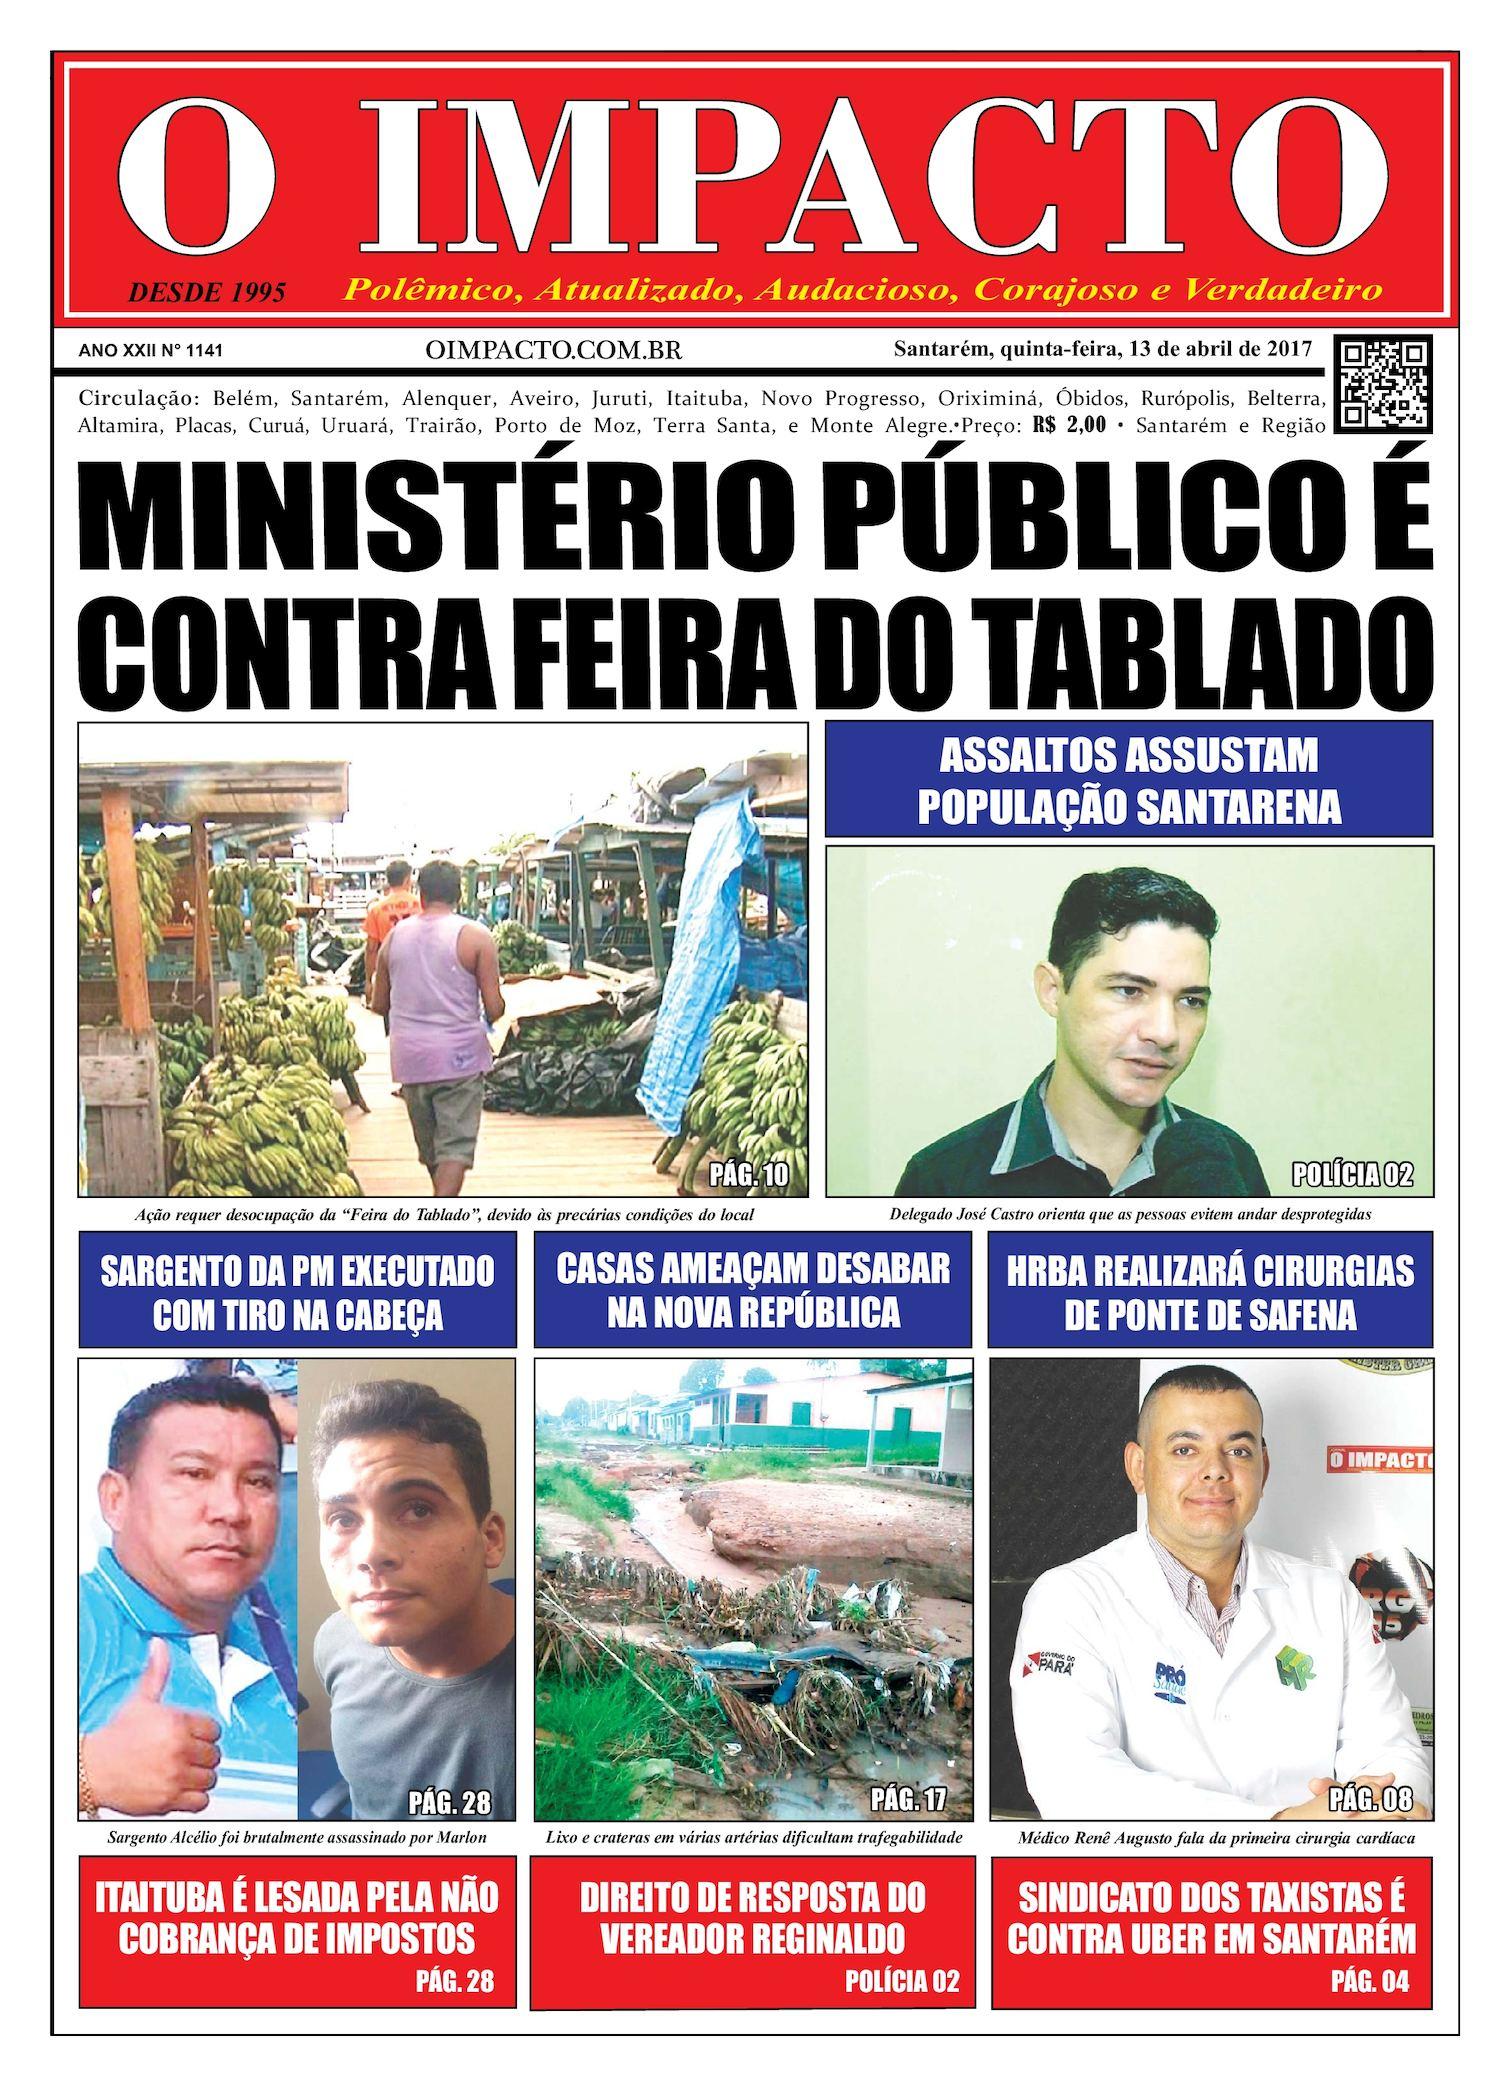 Calaméo - Jornal O Impacto Ed. 1141 11c62b1a973